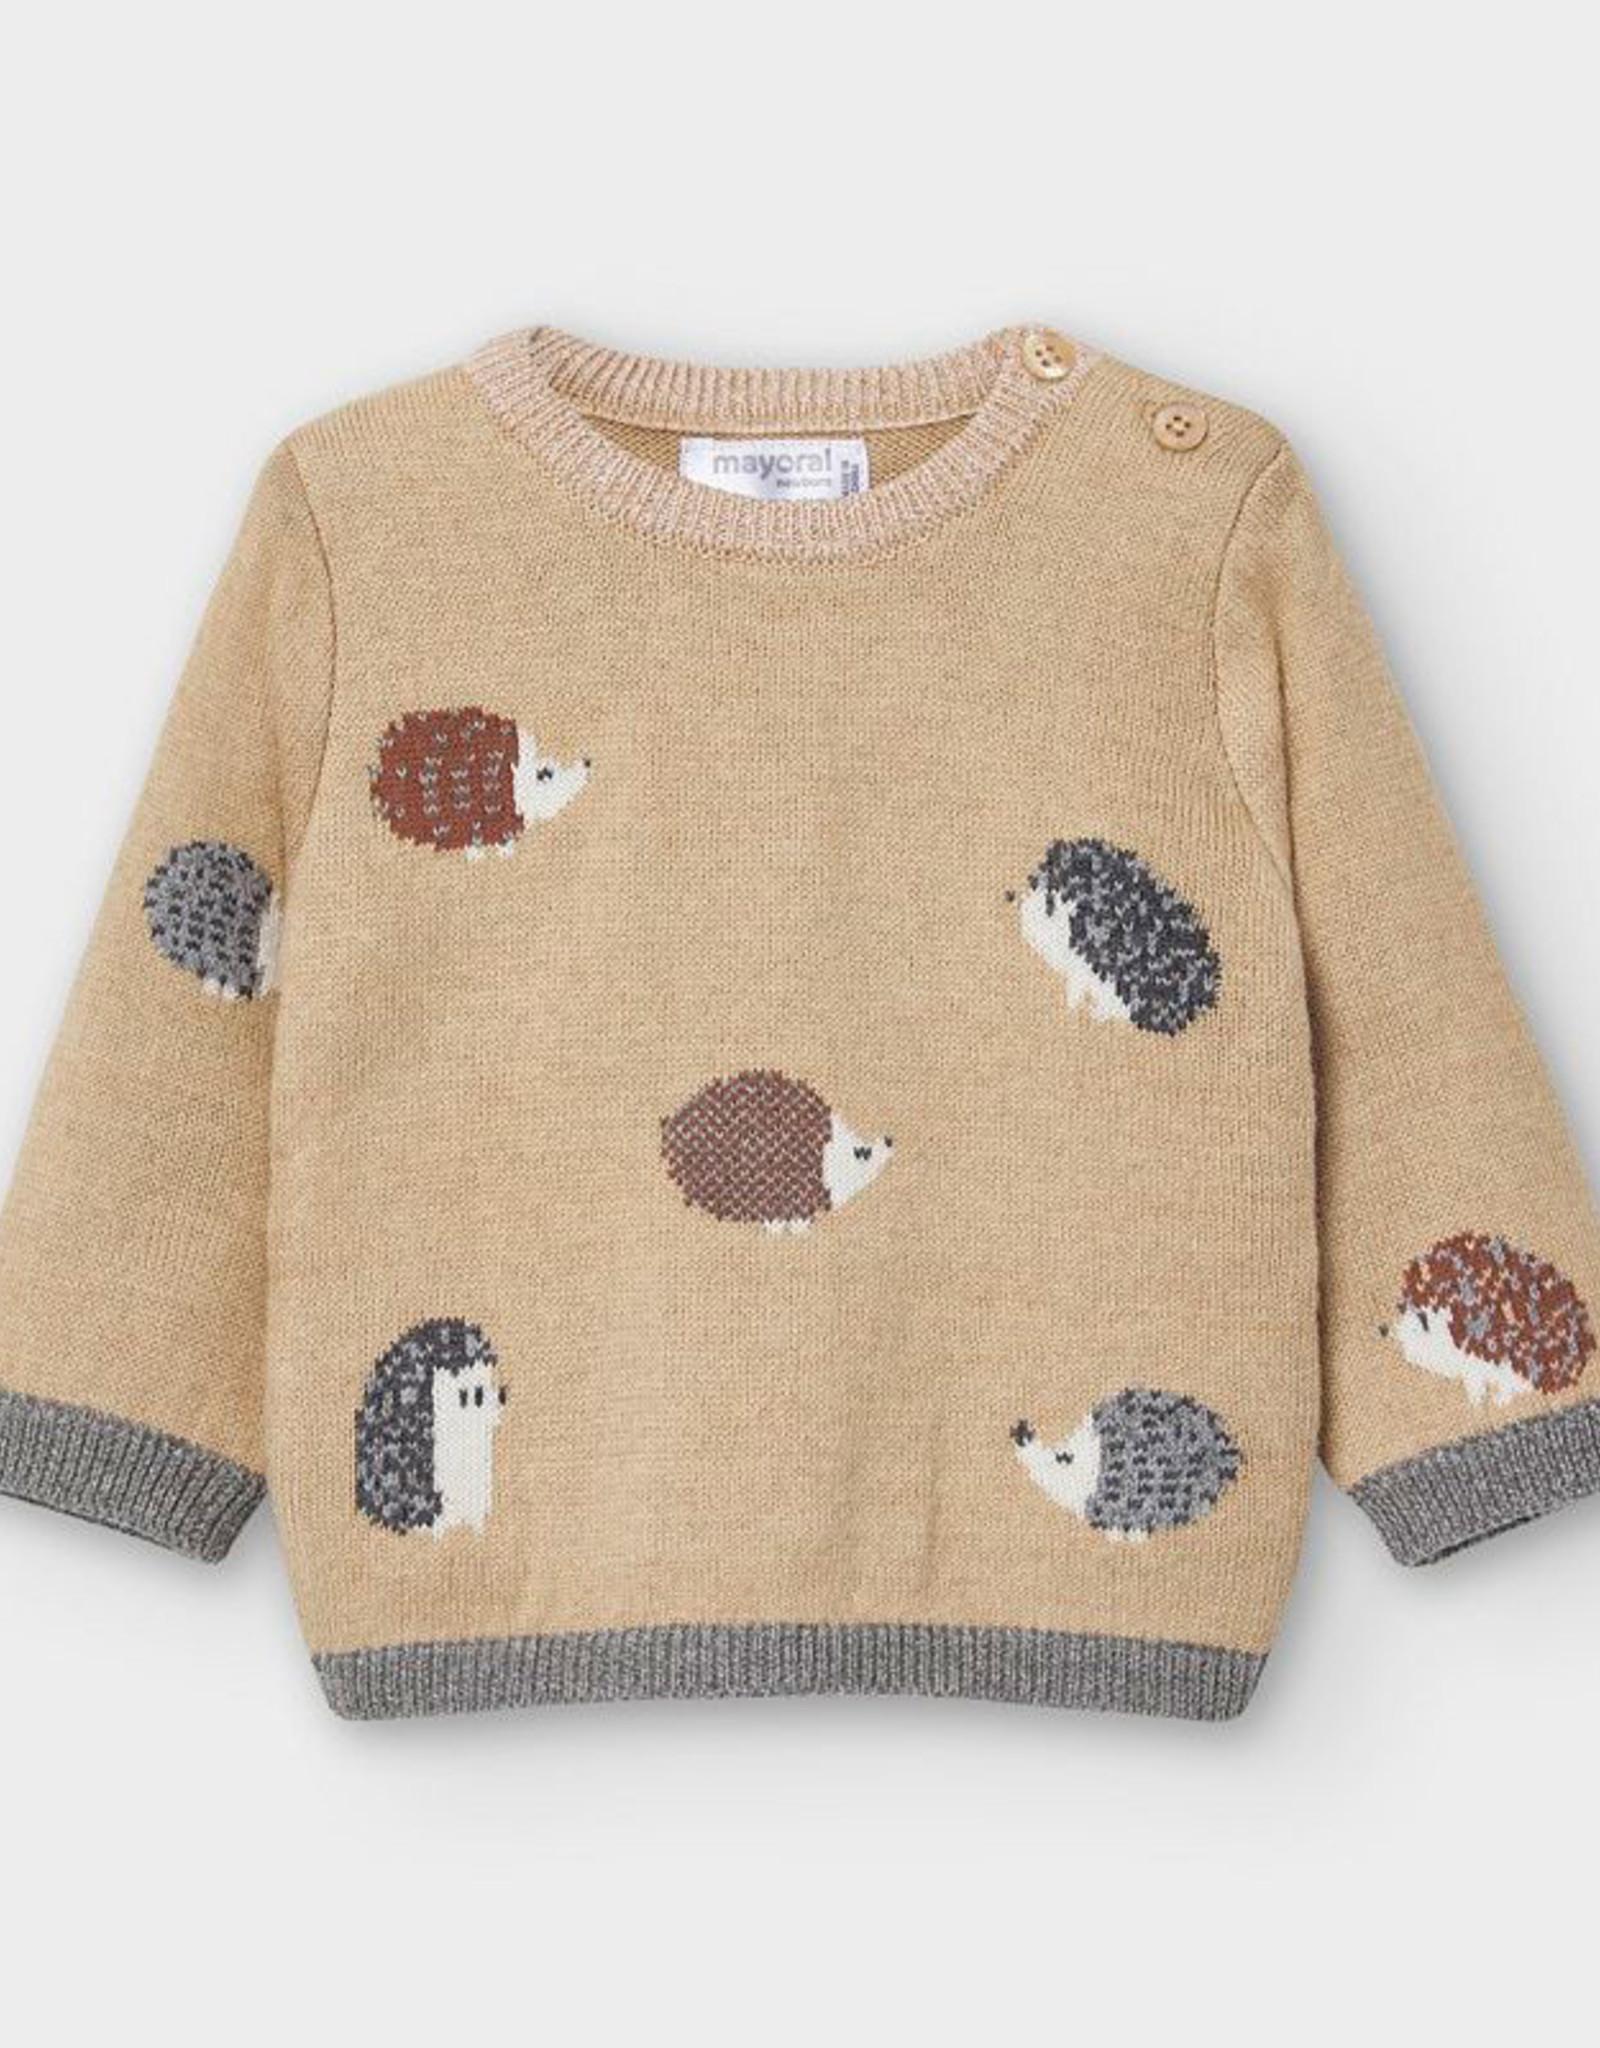 Mayoral FA20 Hedgehog Sweater